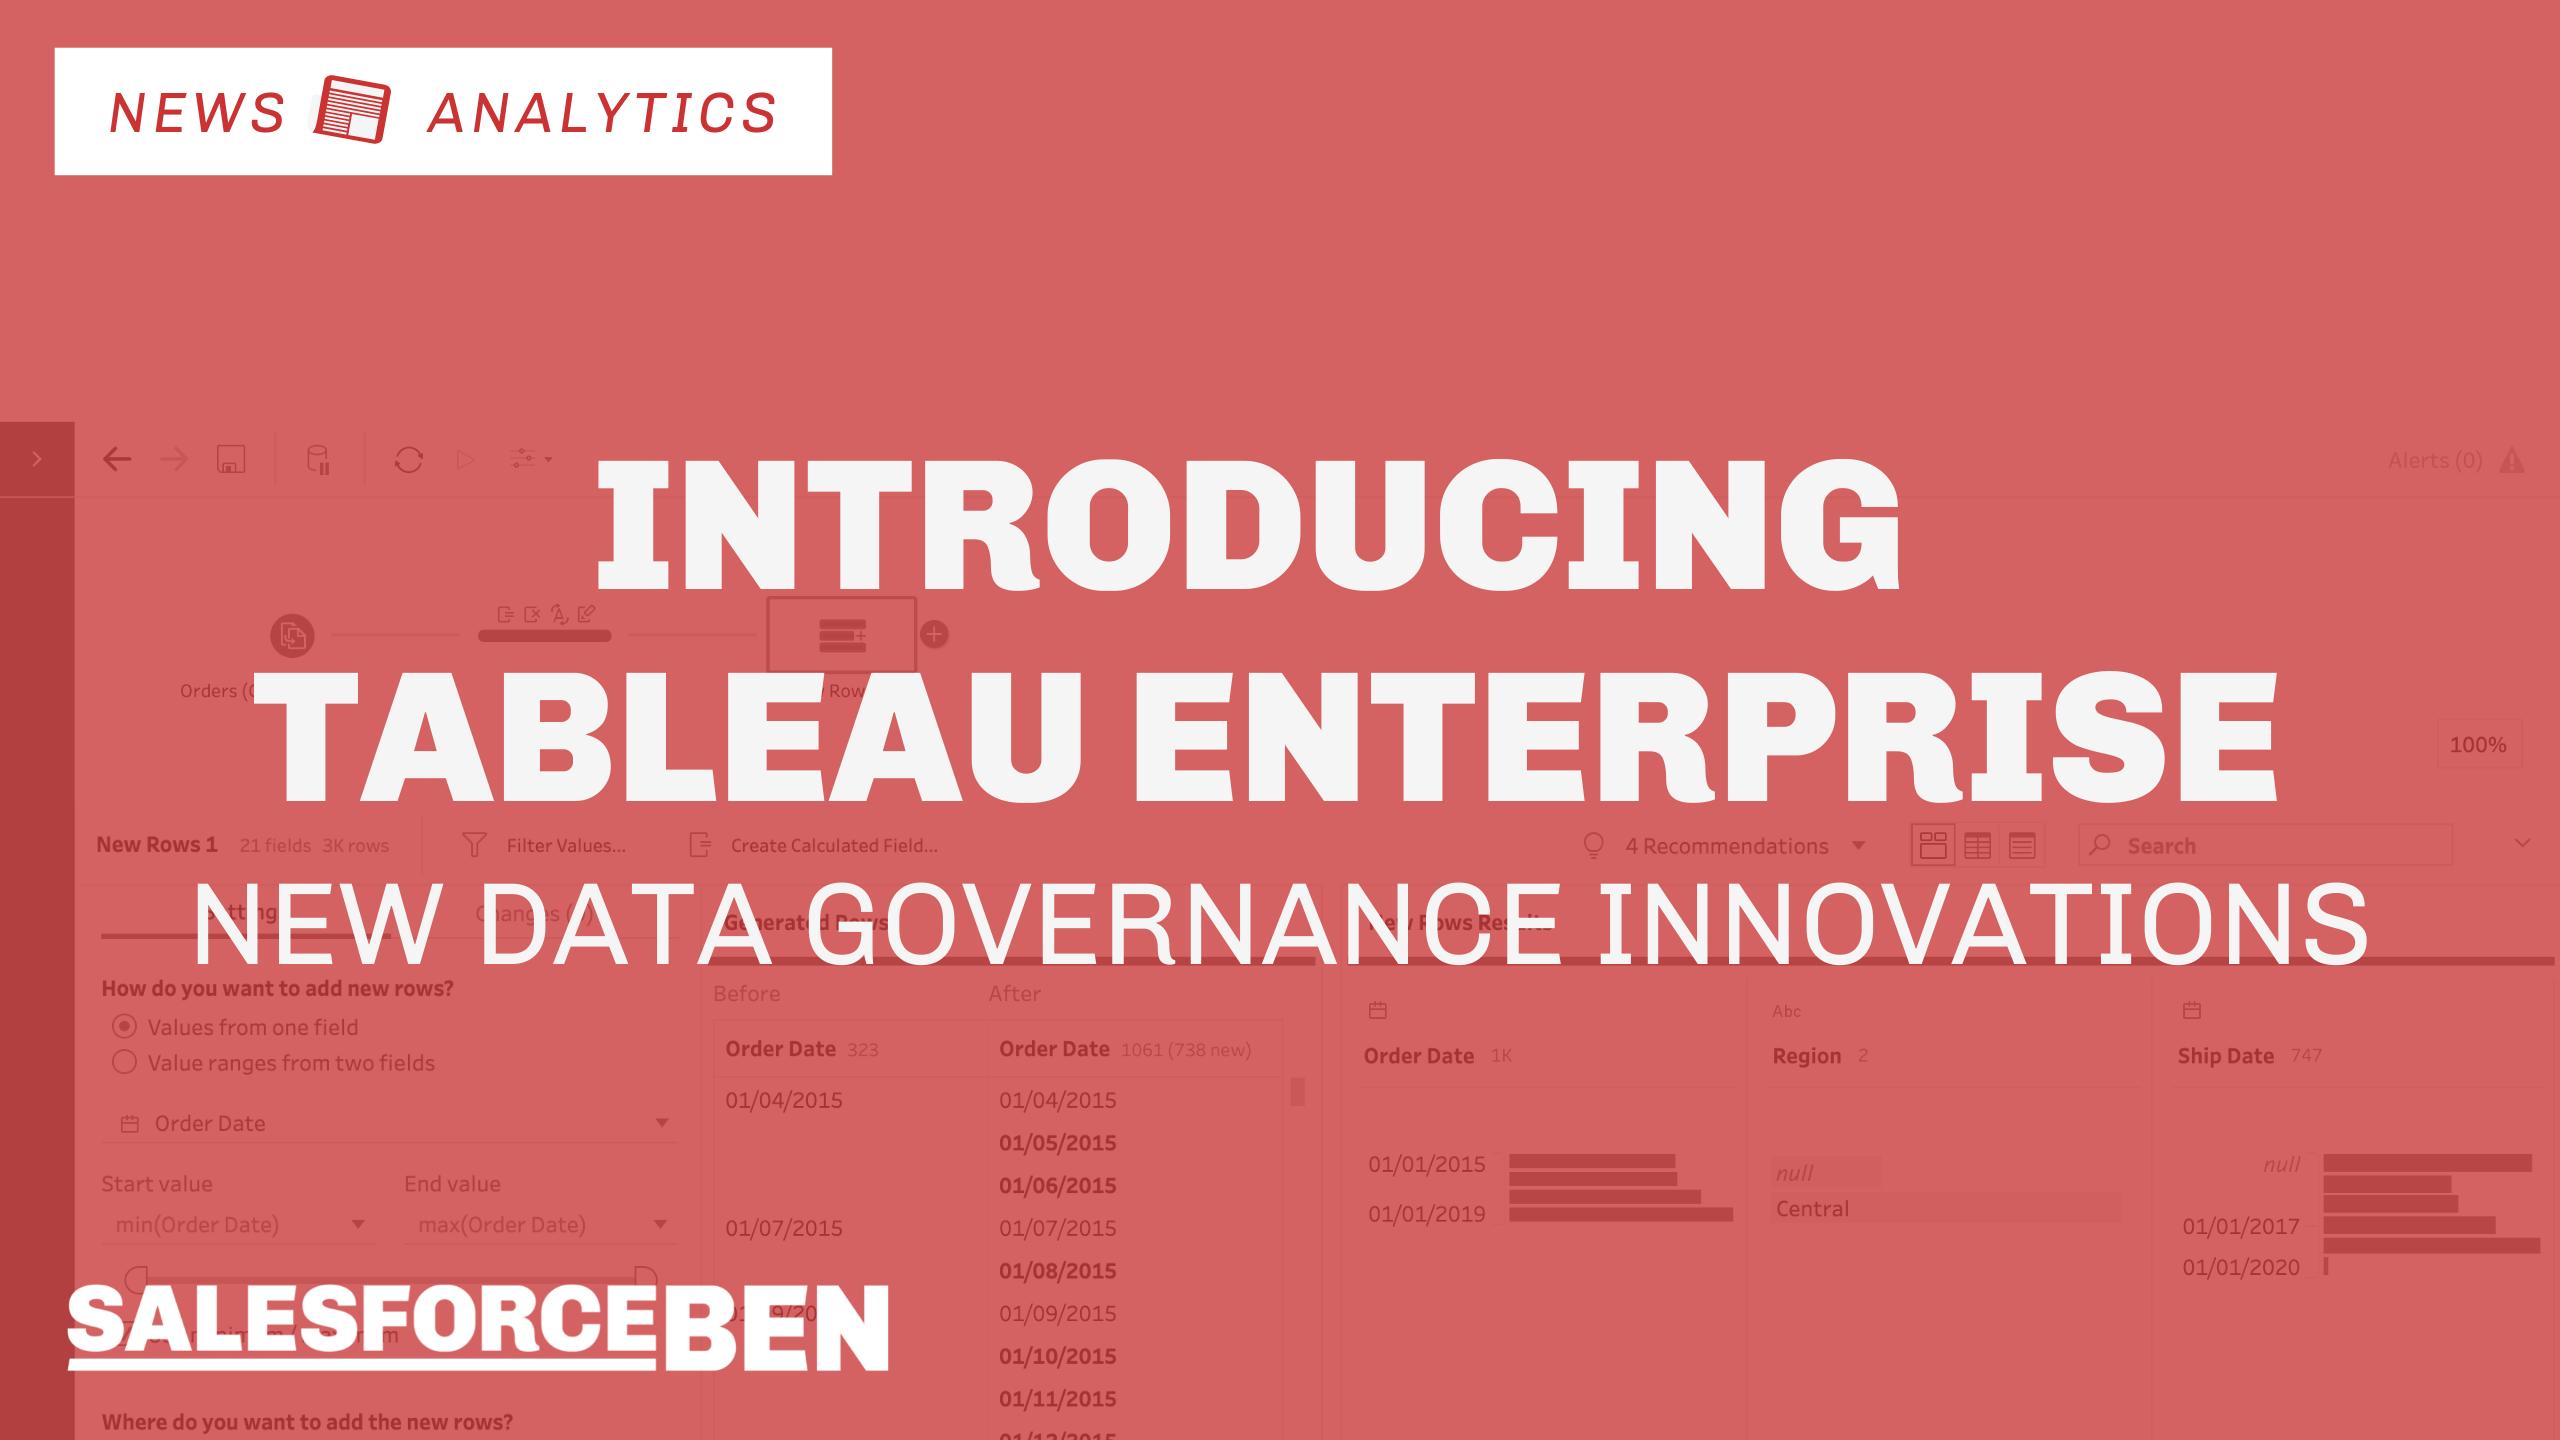 Introducing Tableau Enterprise – New Data Governance Innovations